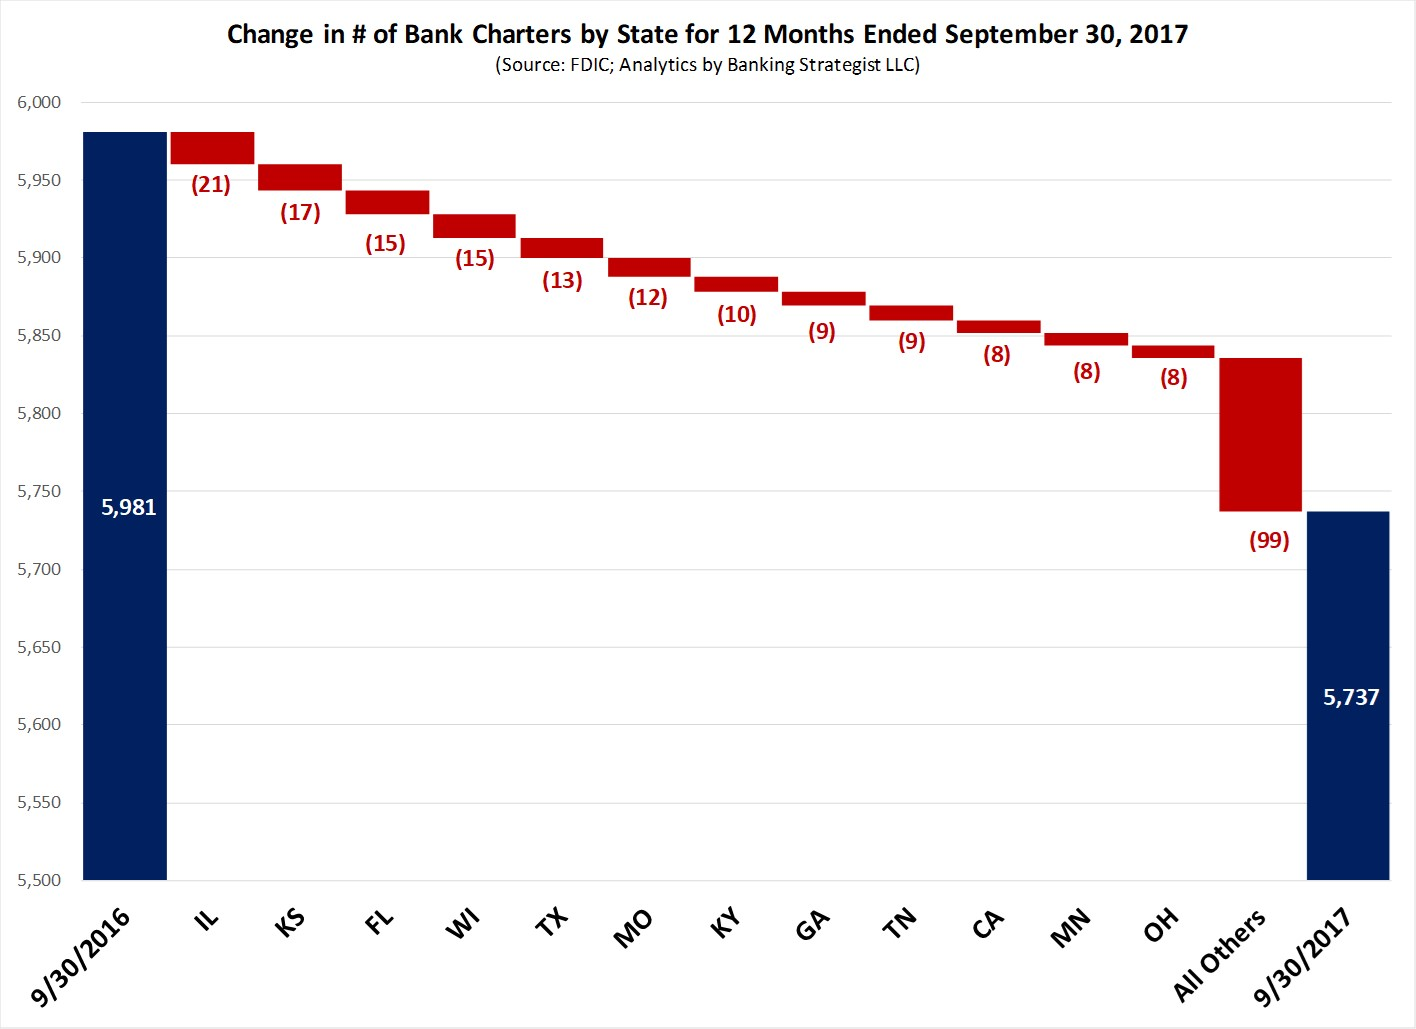 Chg_Bank_Charters_20170930_State.jpg